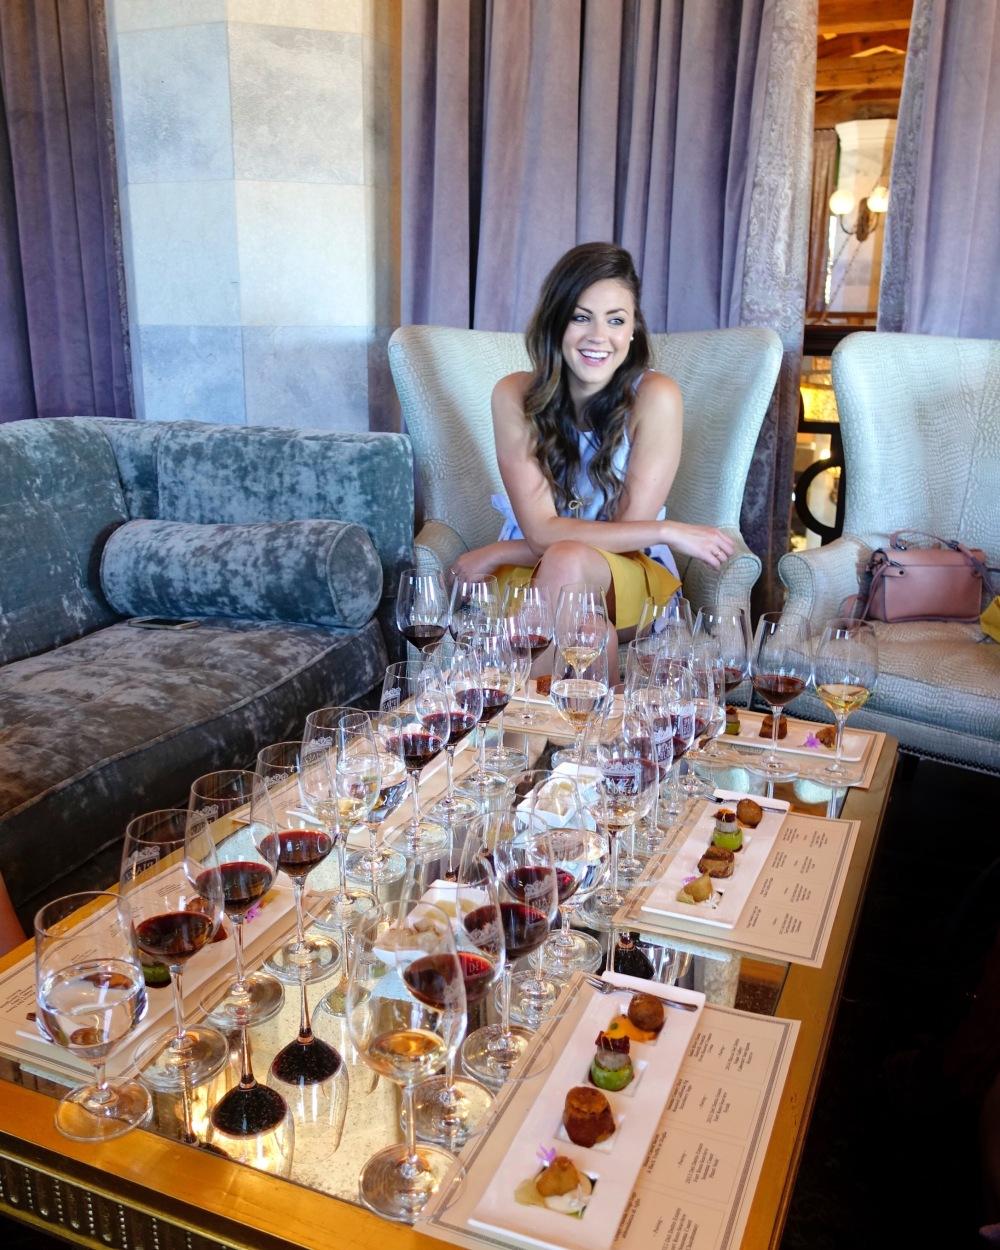 AllyChen-PiazzaDelDotto-Winery.JPG